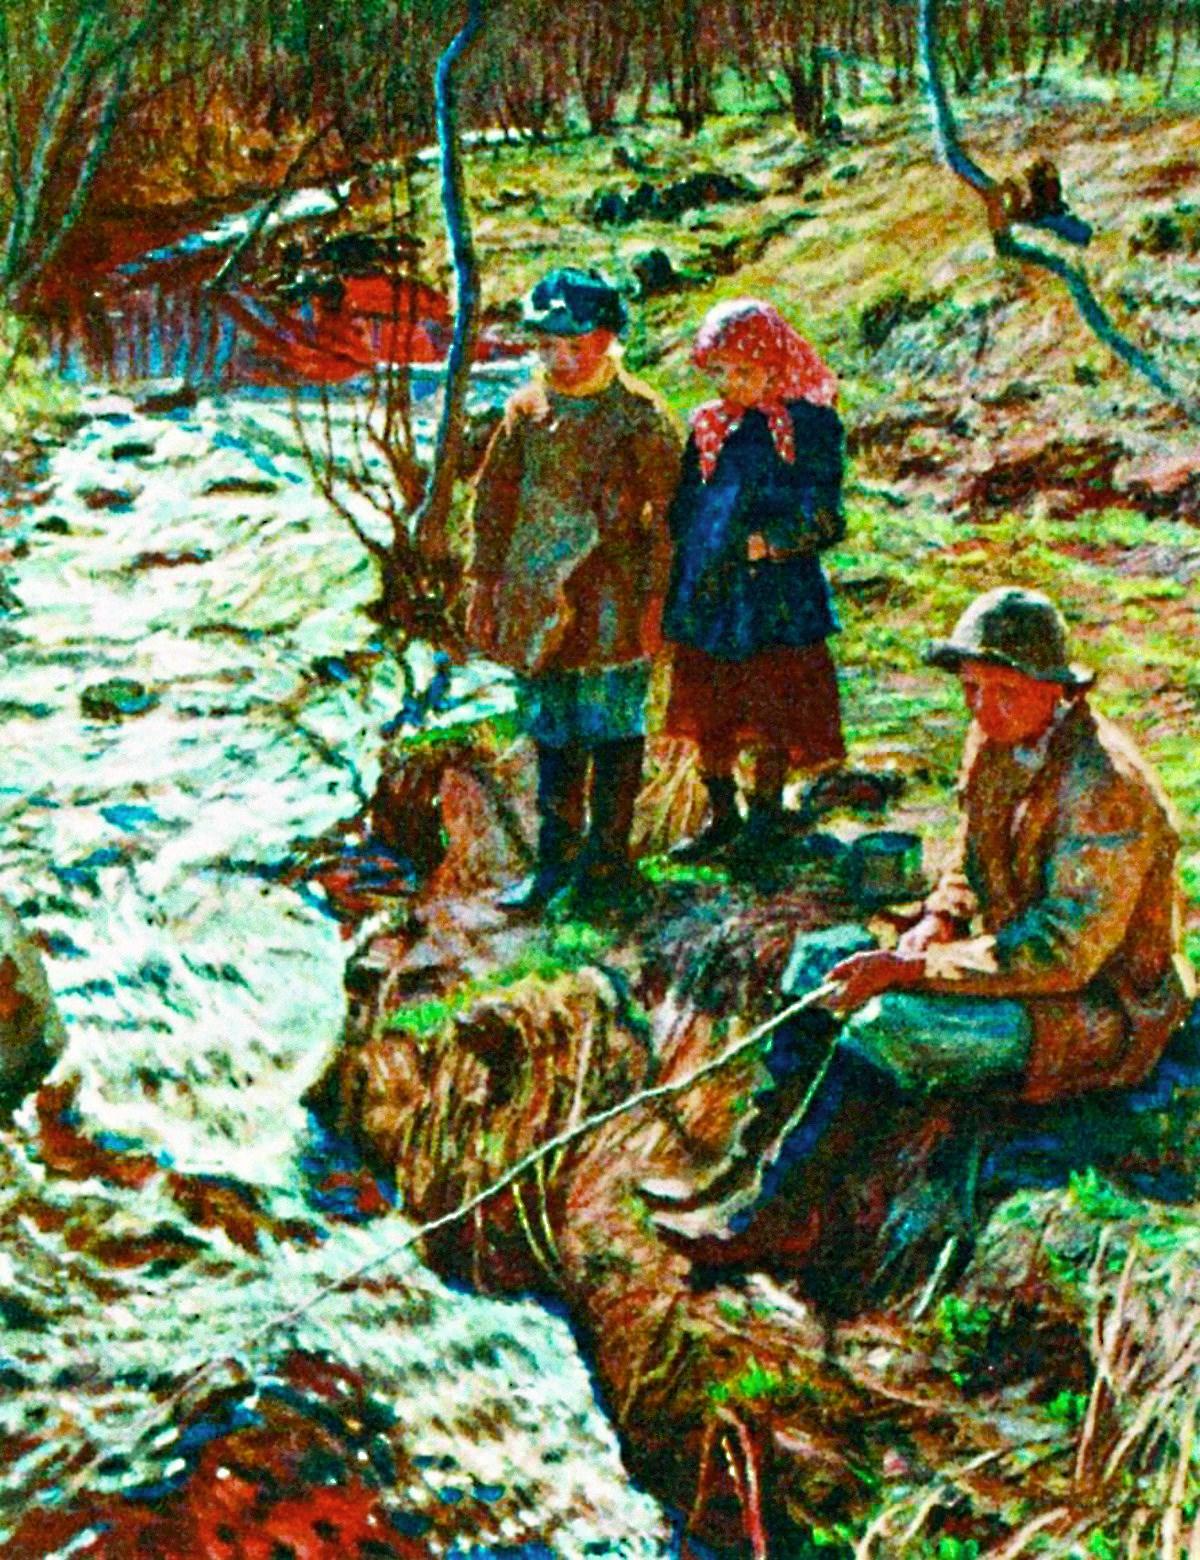 00 Nikolai Bogdanov-Belsky. Trout Fishing. 1920s